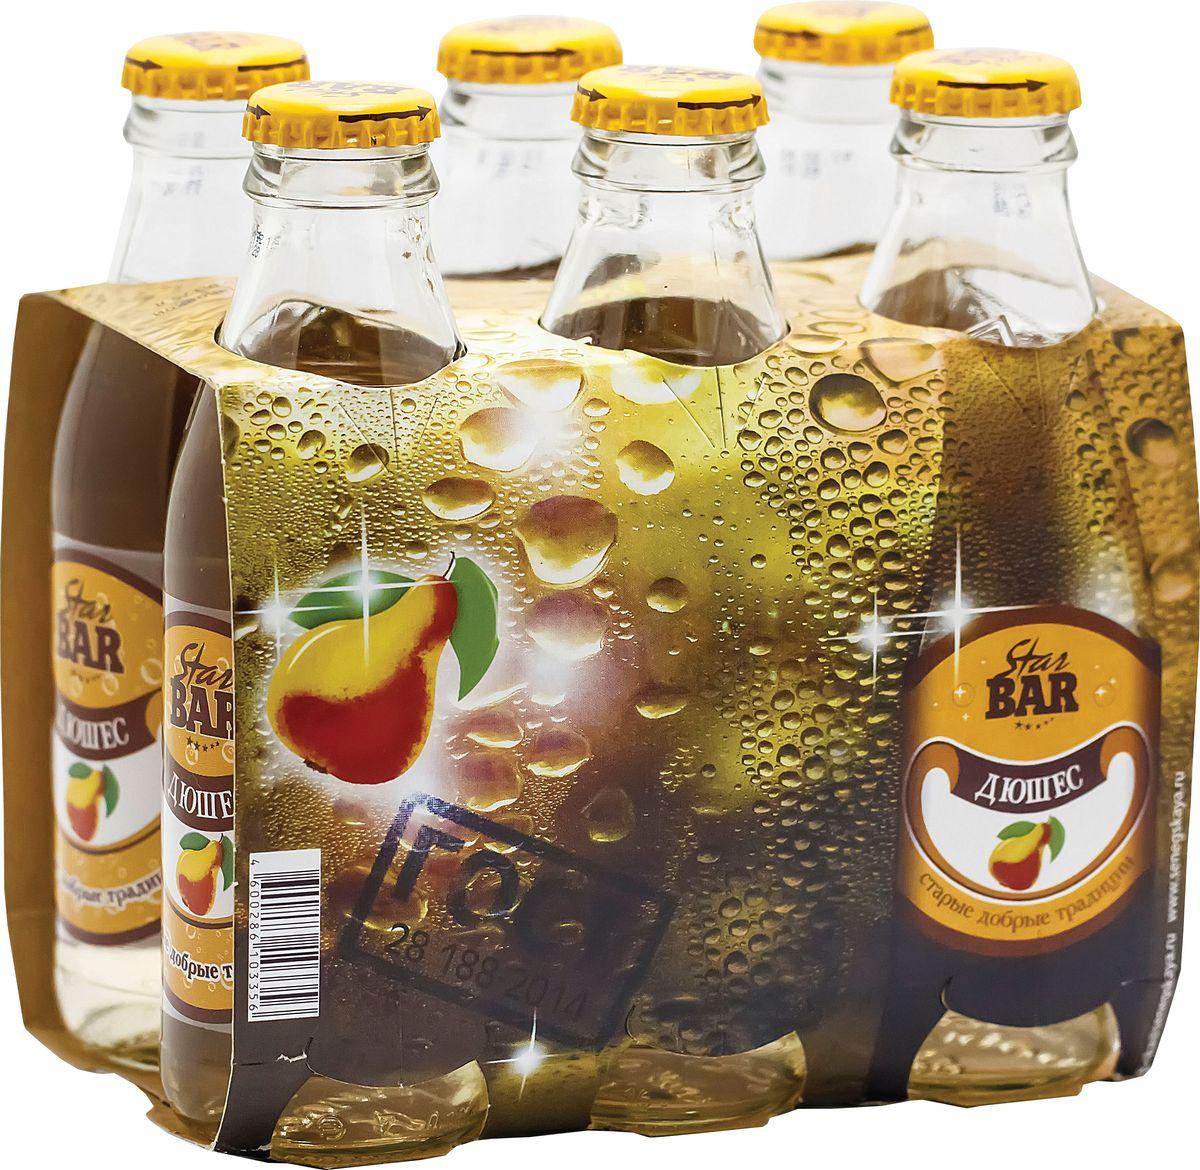 Star Bar Лимонад Дюшес, 6 шт по 0,175 л star bar лимонад экстра ситро 6 шт по 0 175 л